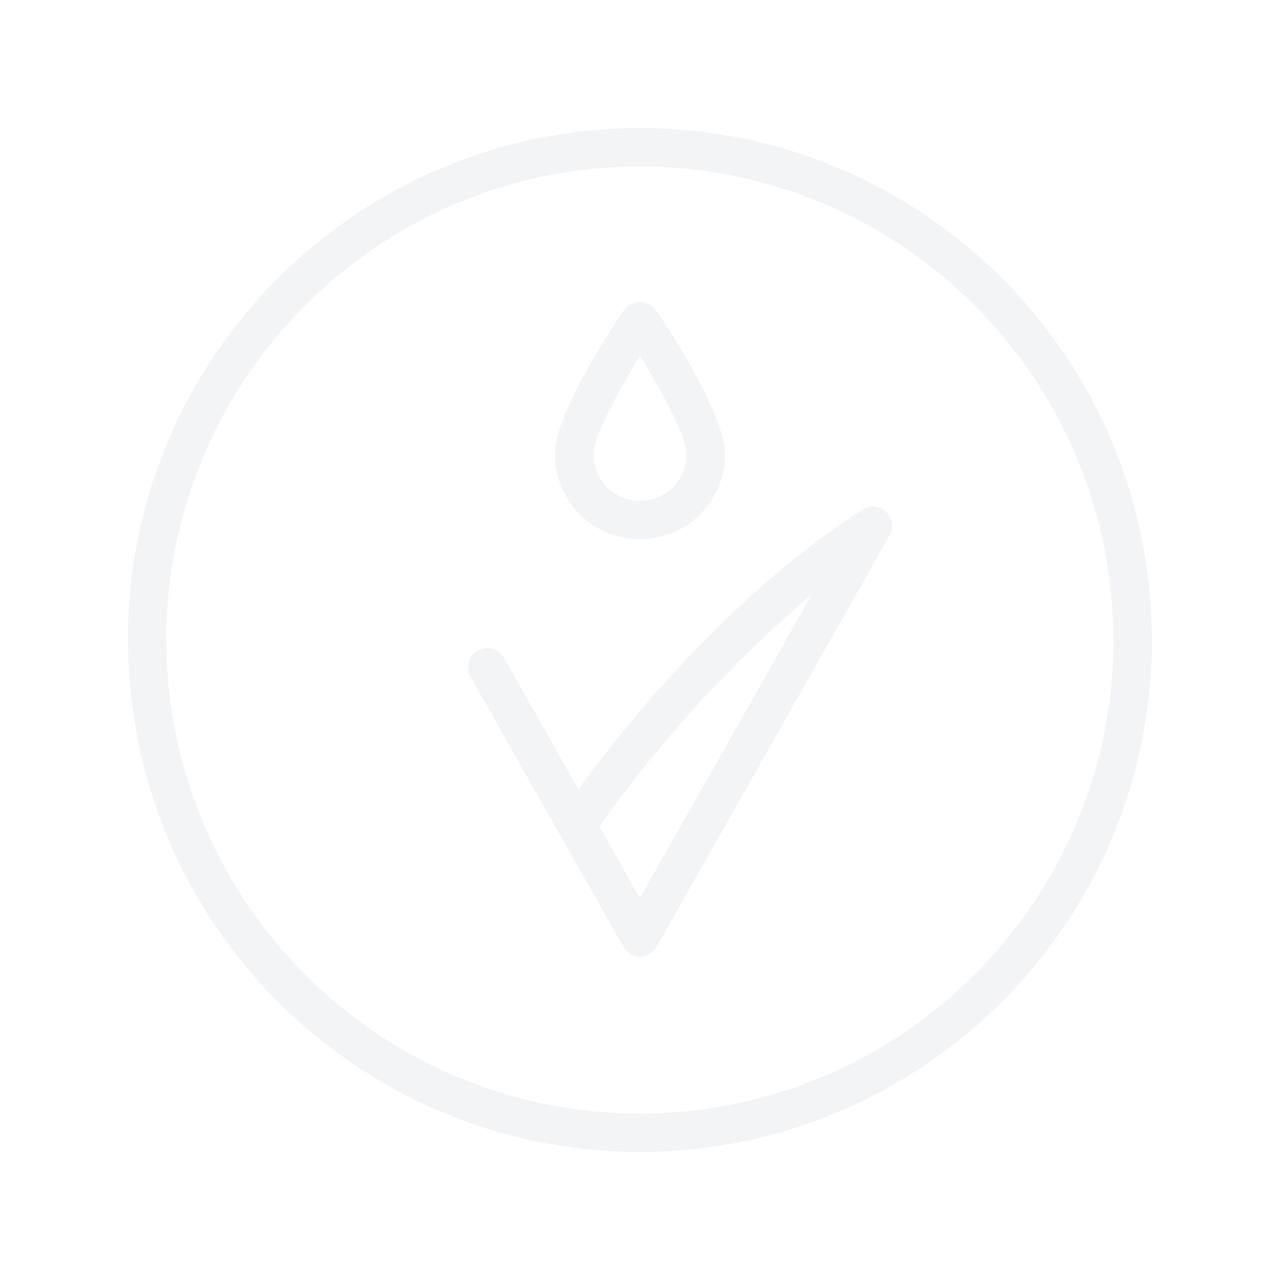 BIOTHERM Aqua-Gelee Self Tanning Face Serum 50ml